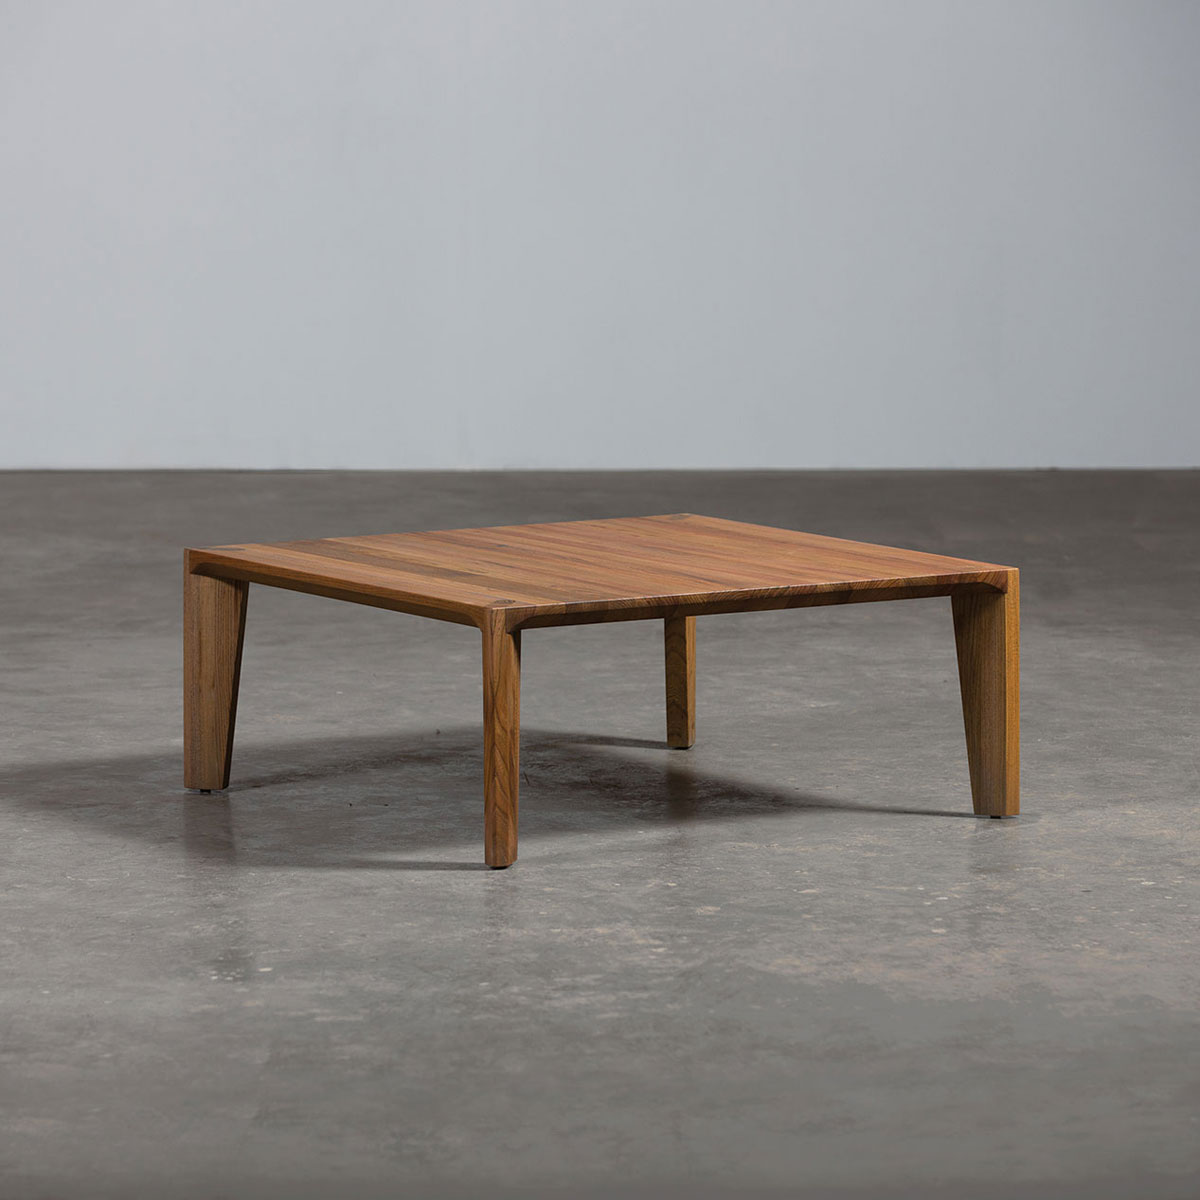 Mesa hanny de artisan en madera con dise o vanguardista y - Mesas madera diseno ...